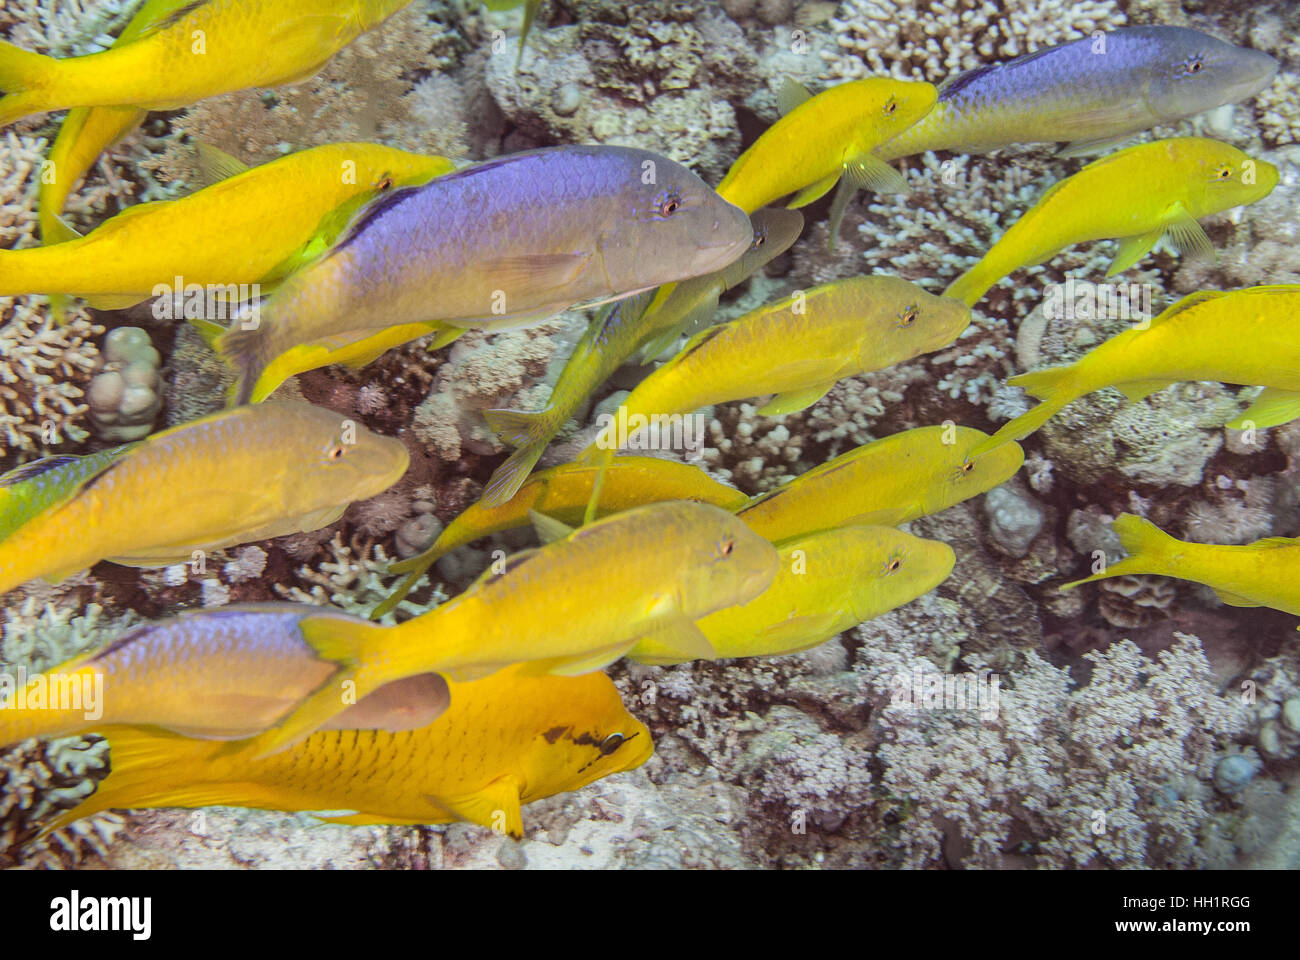 Goldspotted Gaotfish, Parupeneus cyclostomus, Red Sea, Ras Mohammed, Egypt - Stock Image